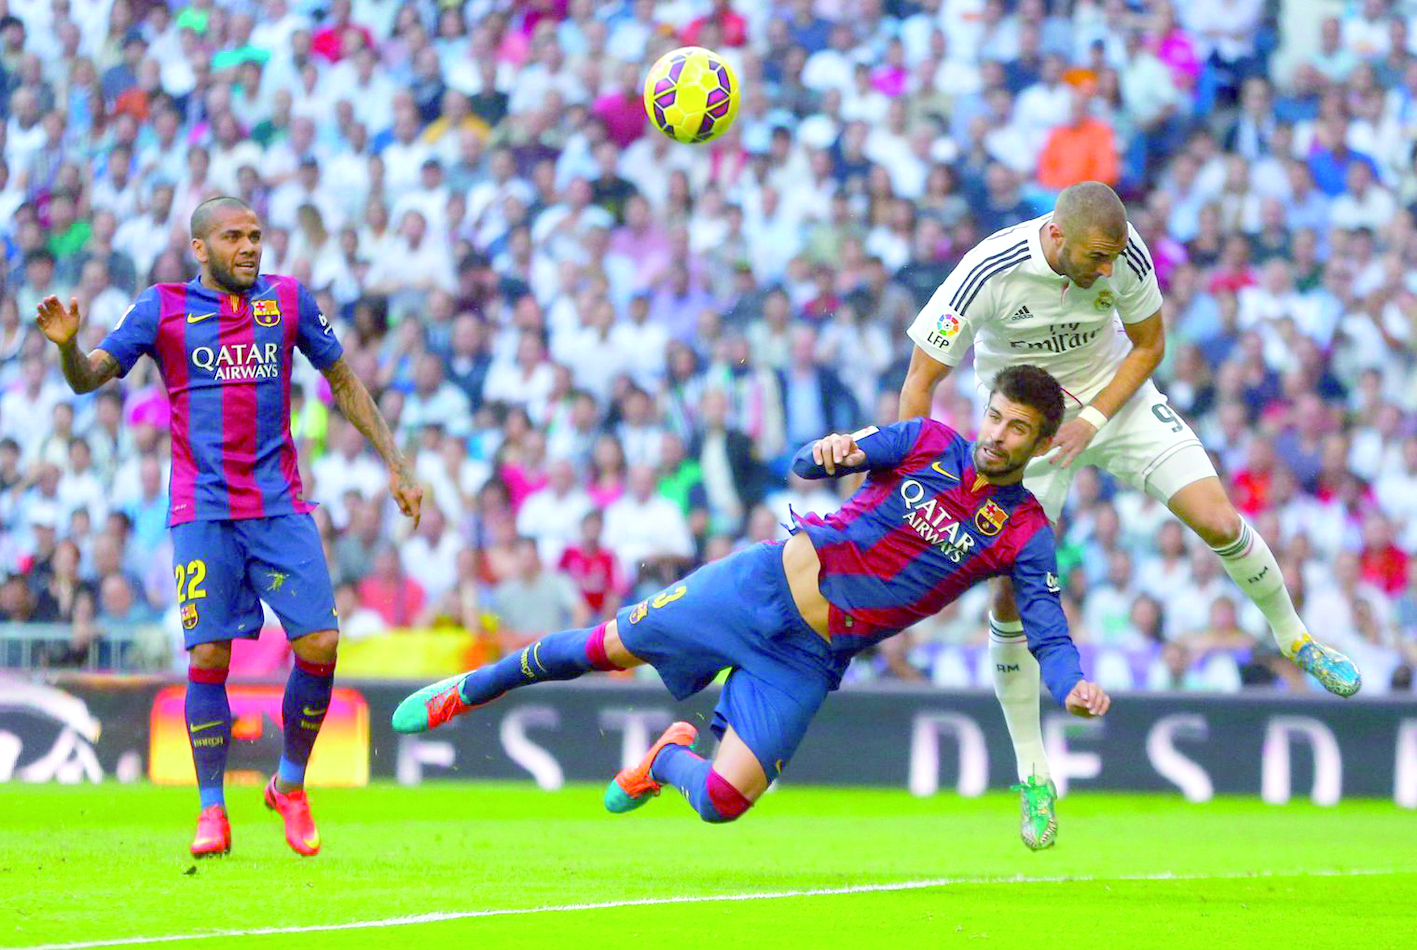 Le Real stoppe l'élan du Barça